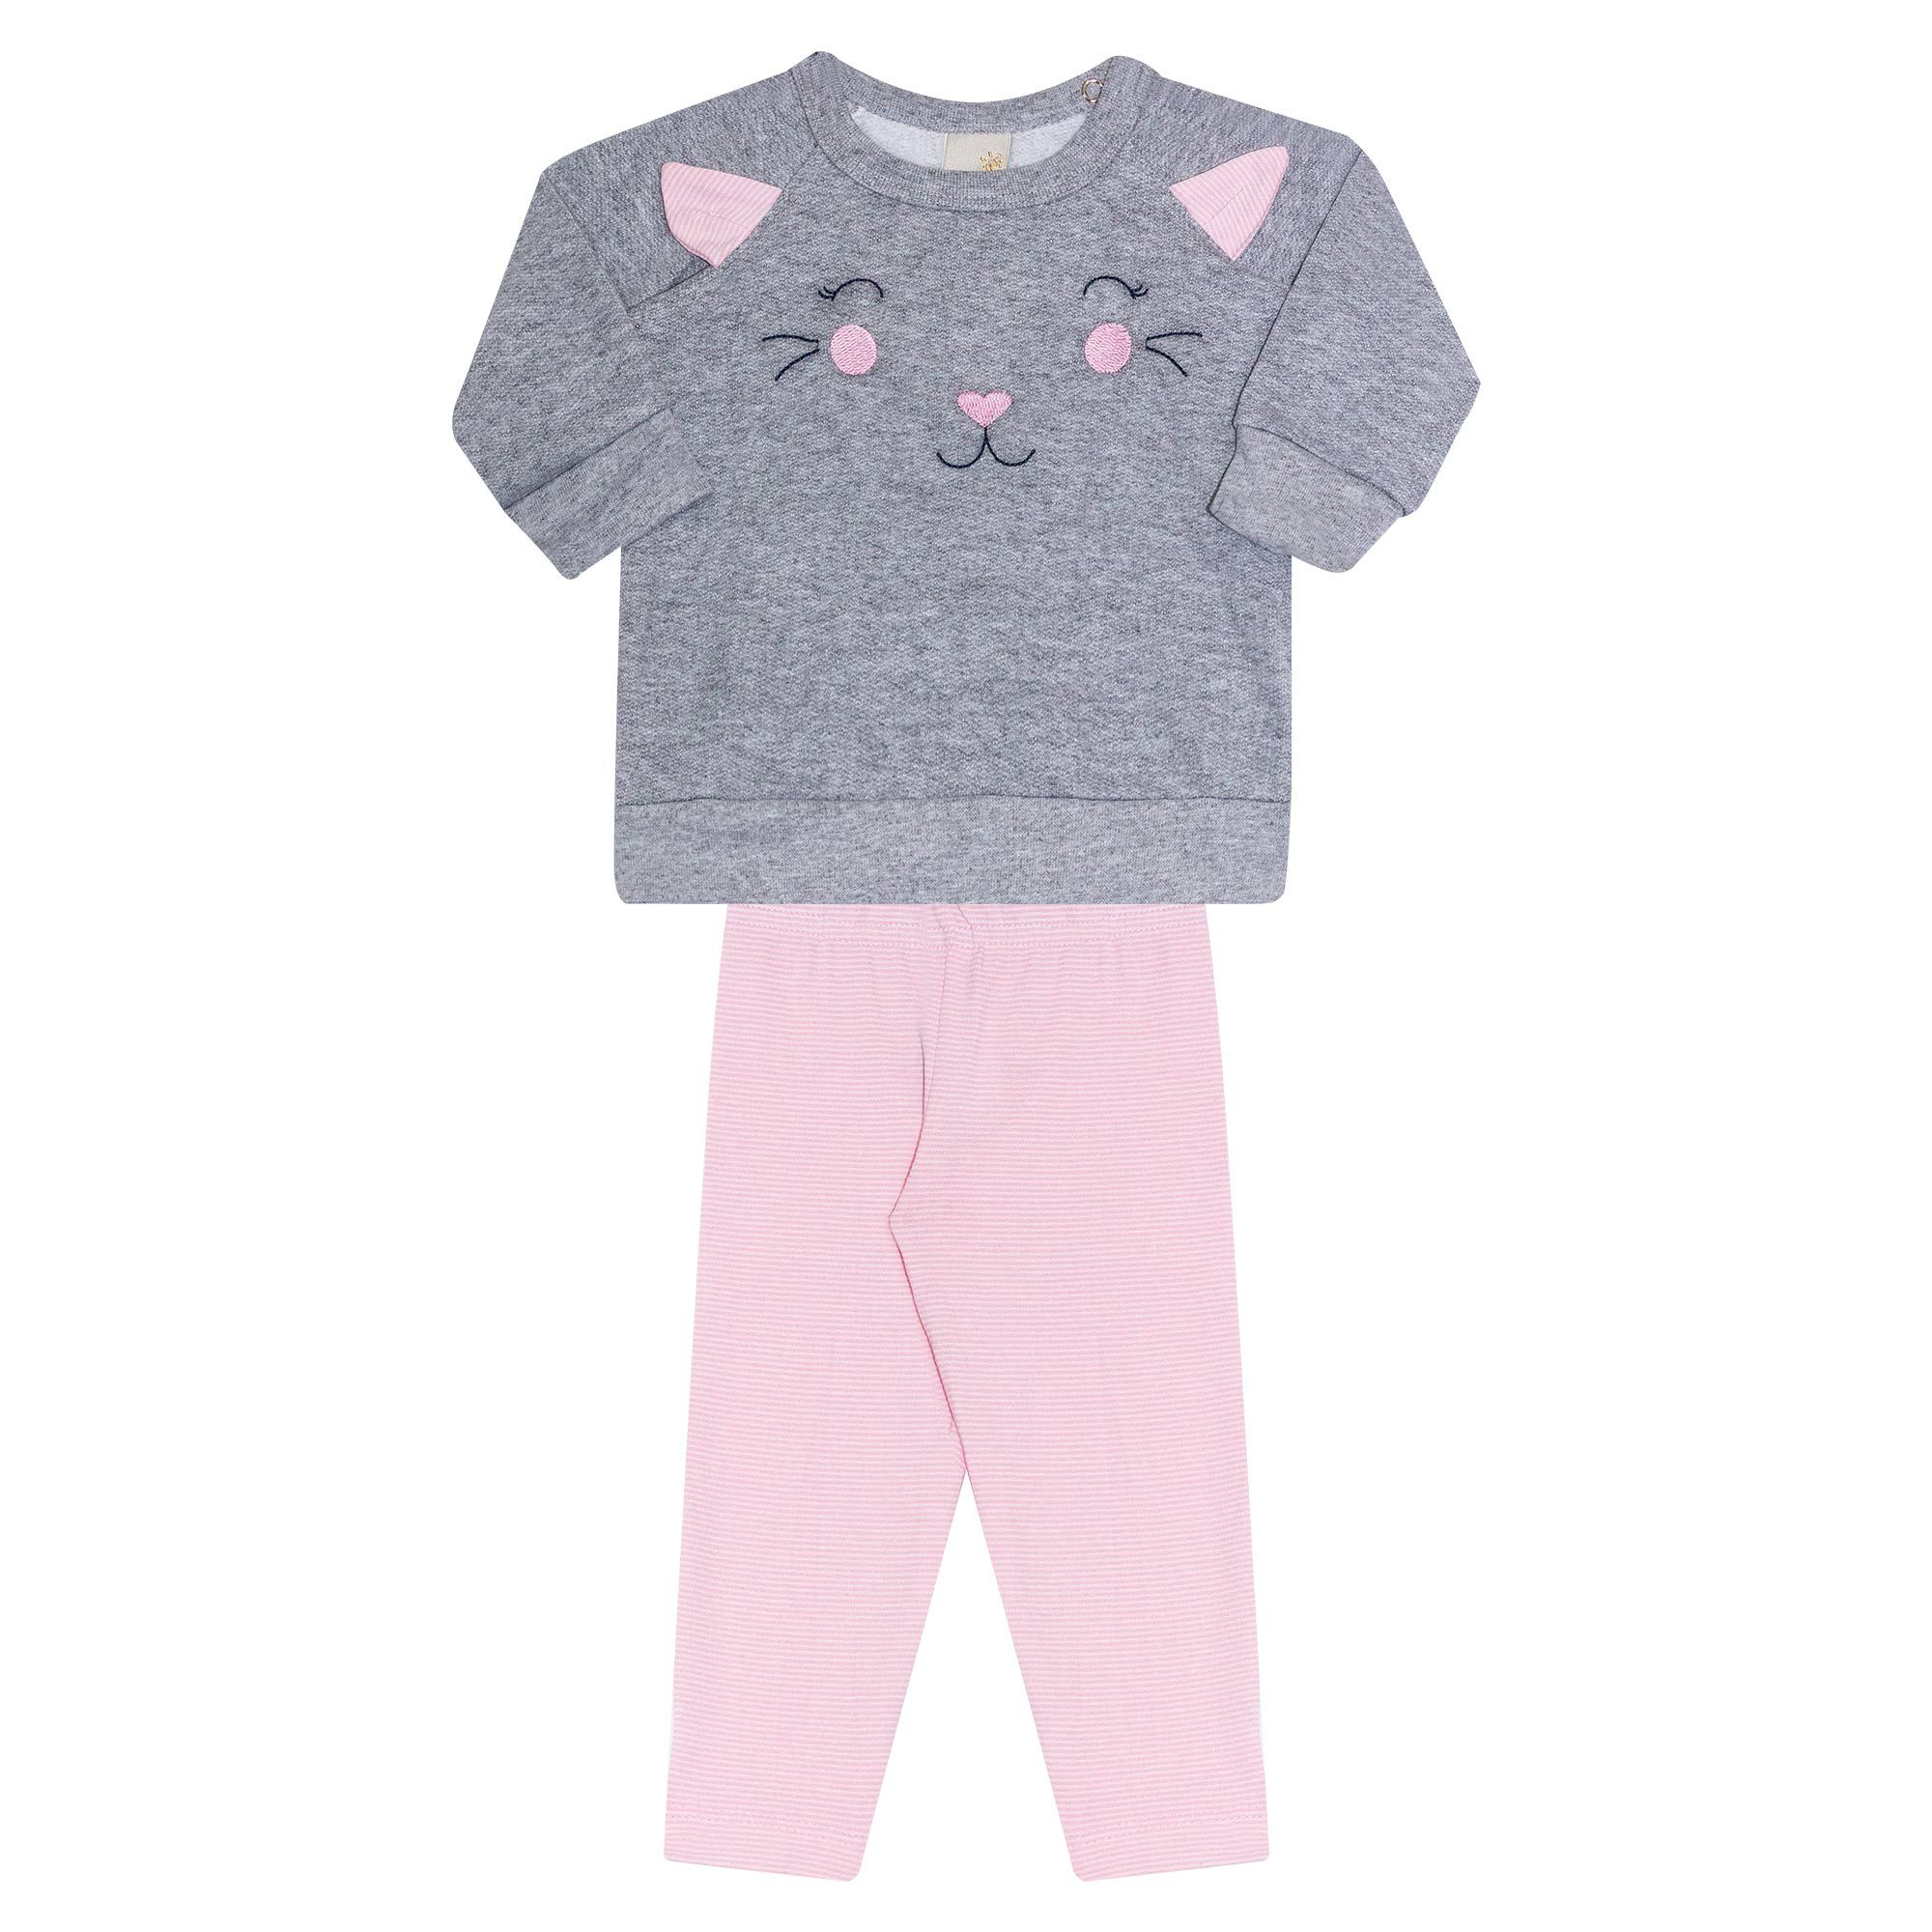 Conjunto Infantil Feminino  2 peças - Ref 7055 - Mescla/Rosa - Ralakids